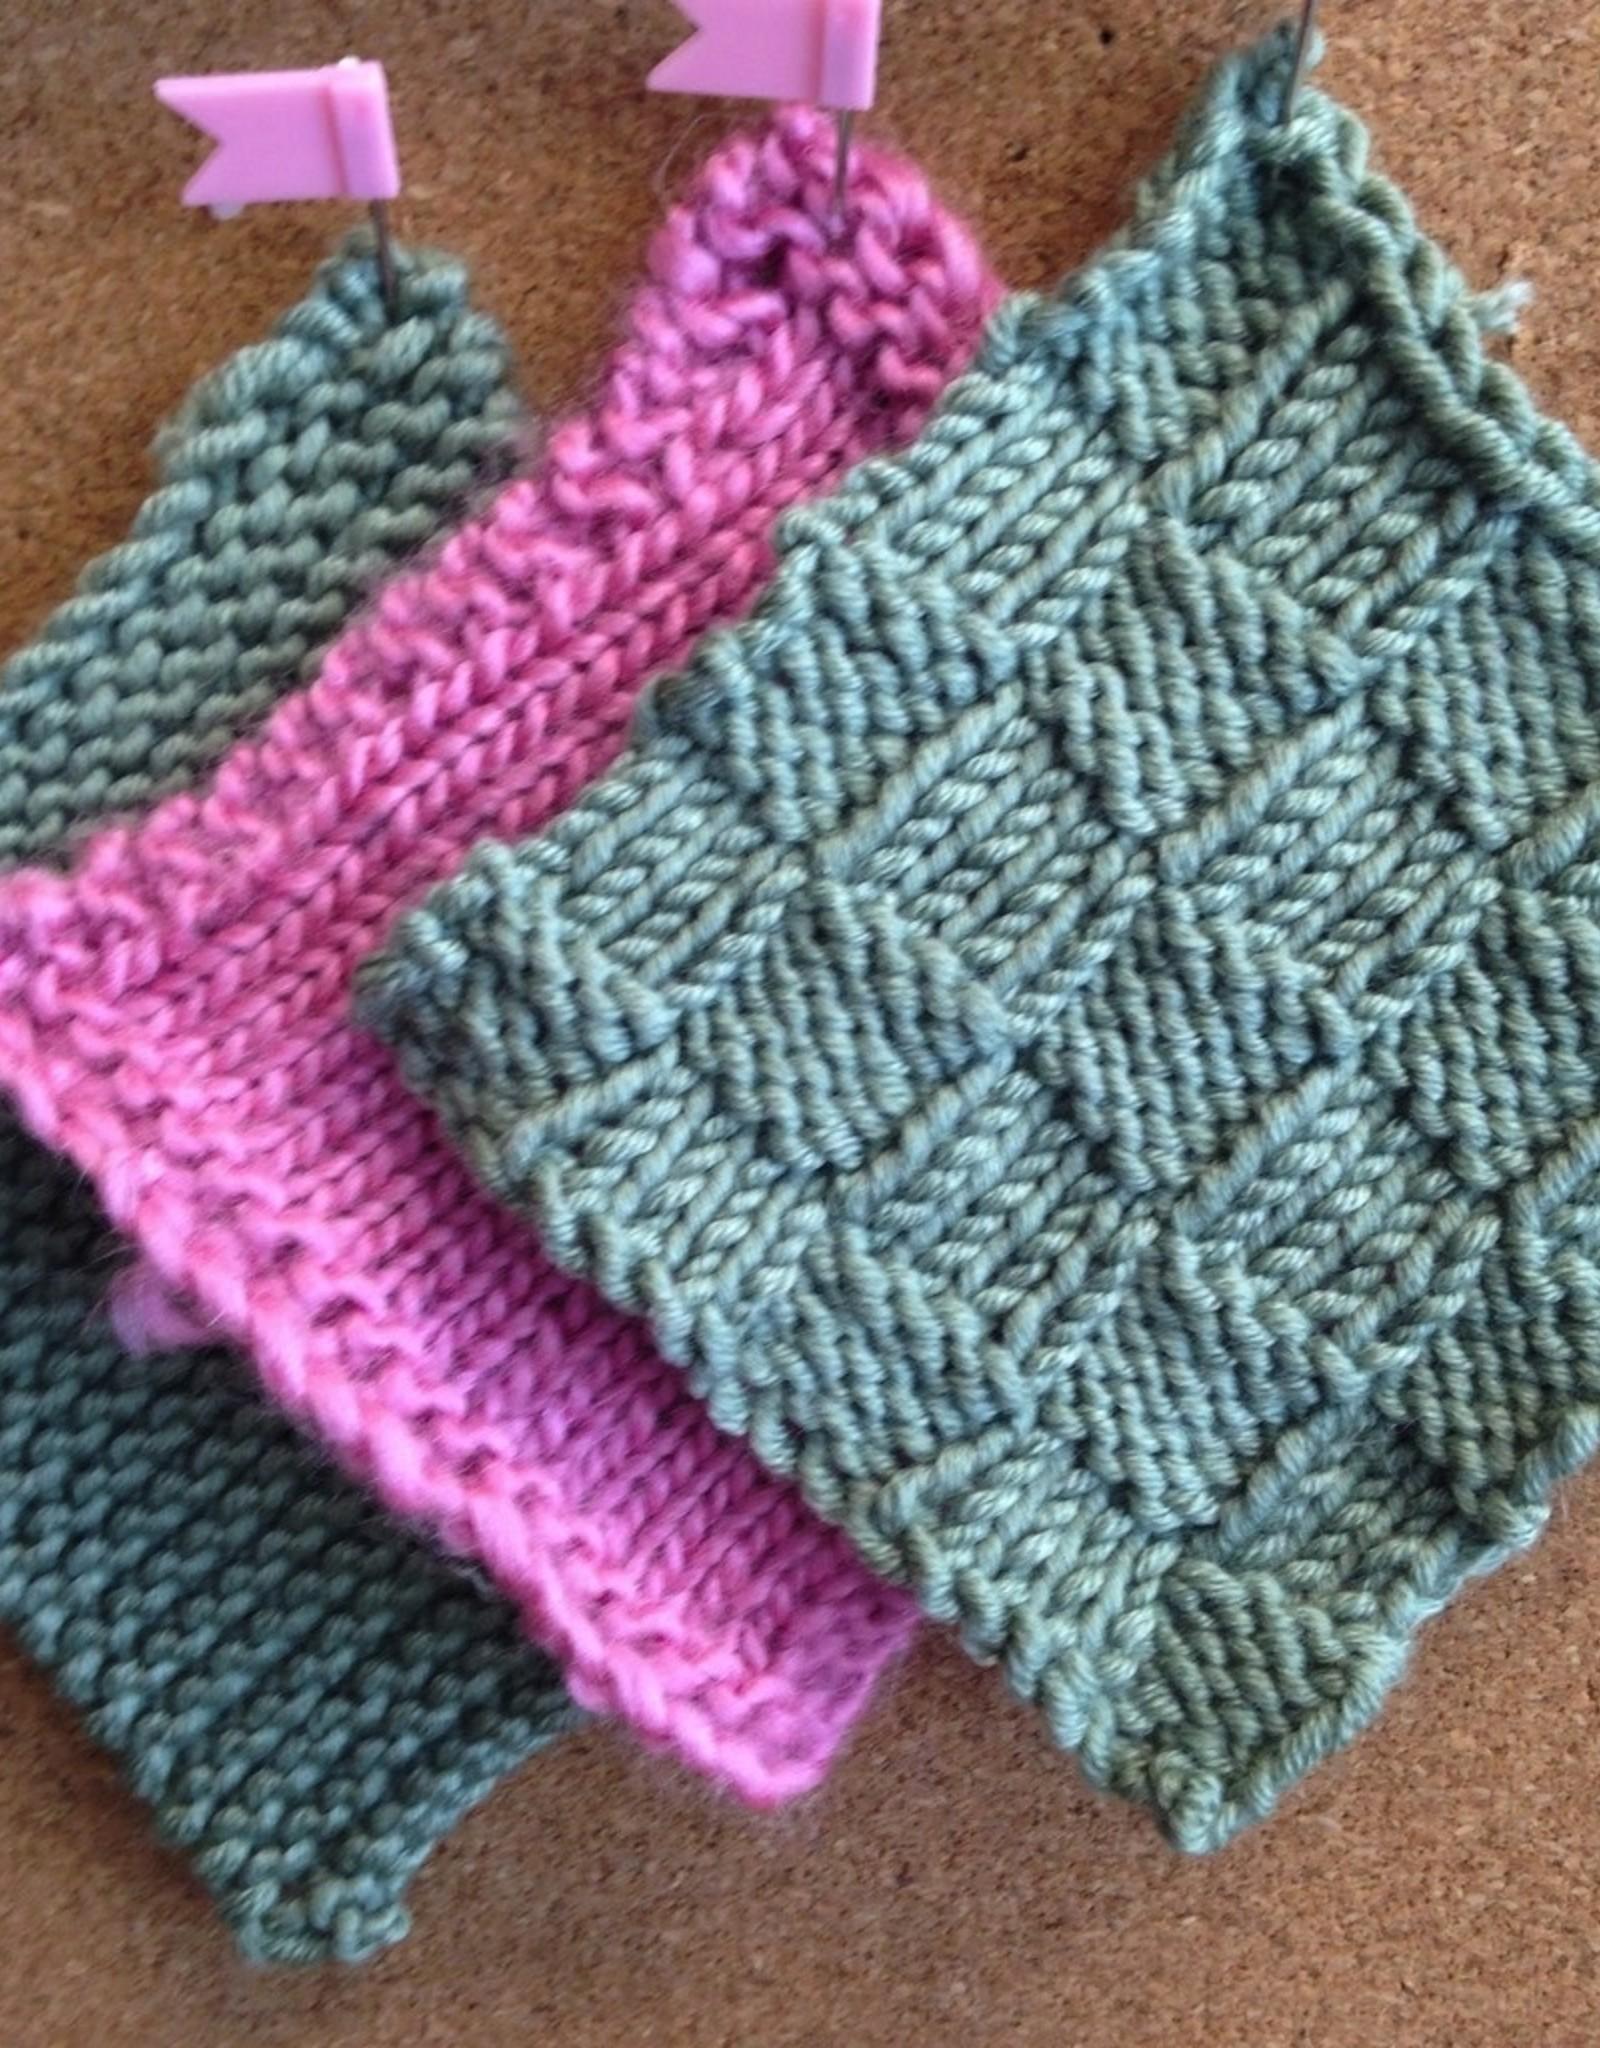 Heather Brown Knitting 101 (Beginning) - Saturdays, September 11 & 18th, 10am-12pm